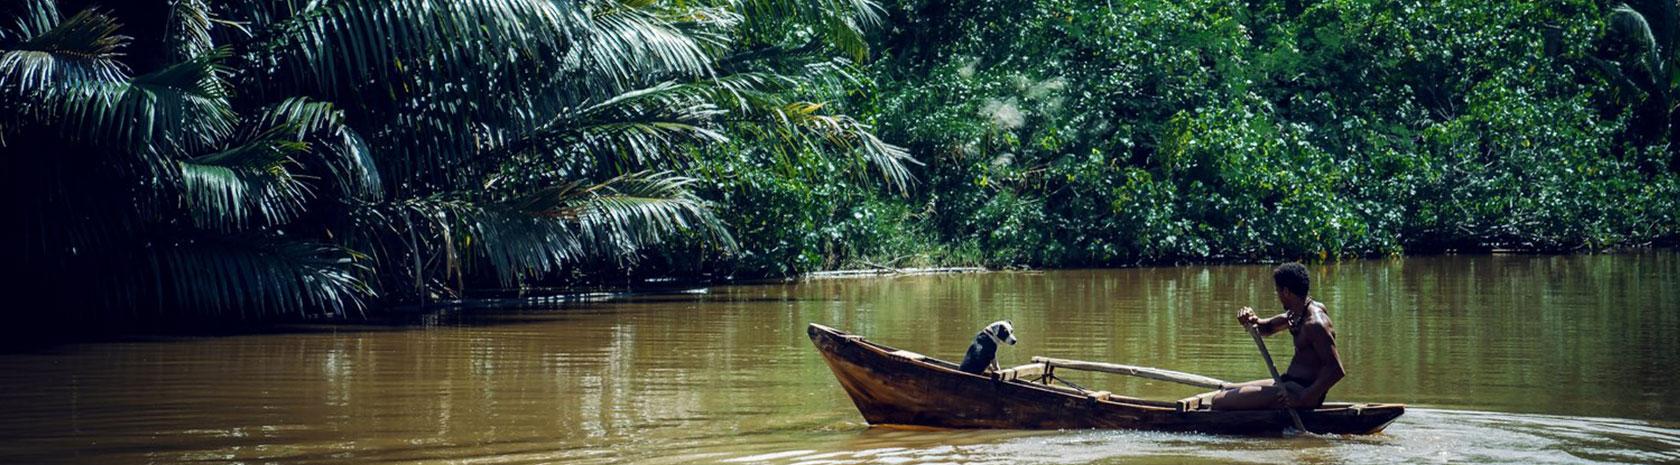 An island native paddles his handmade canoe through a brown river inside of a dense jungle.